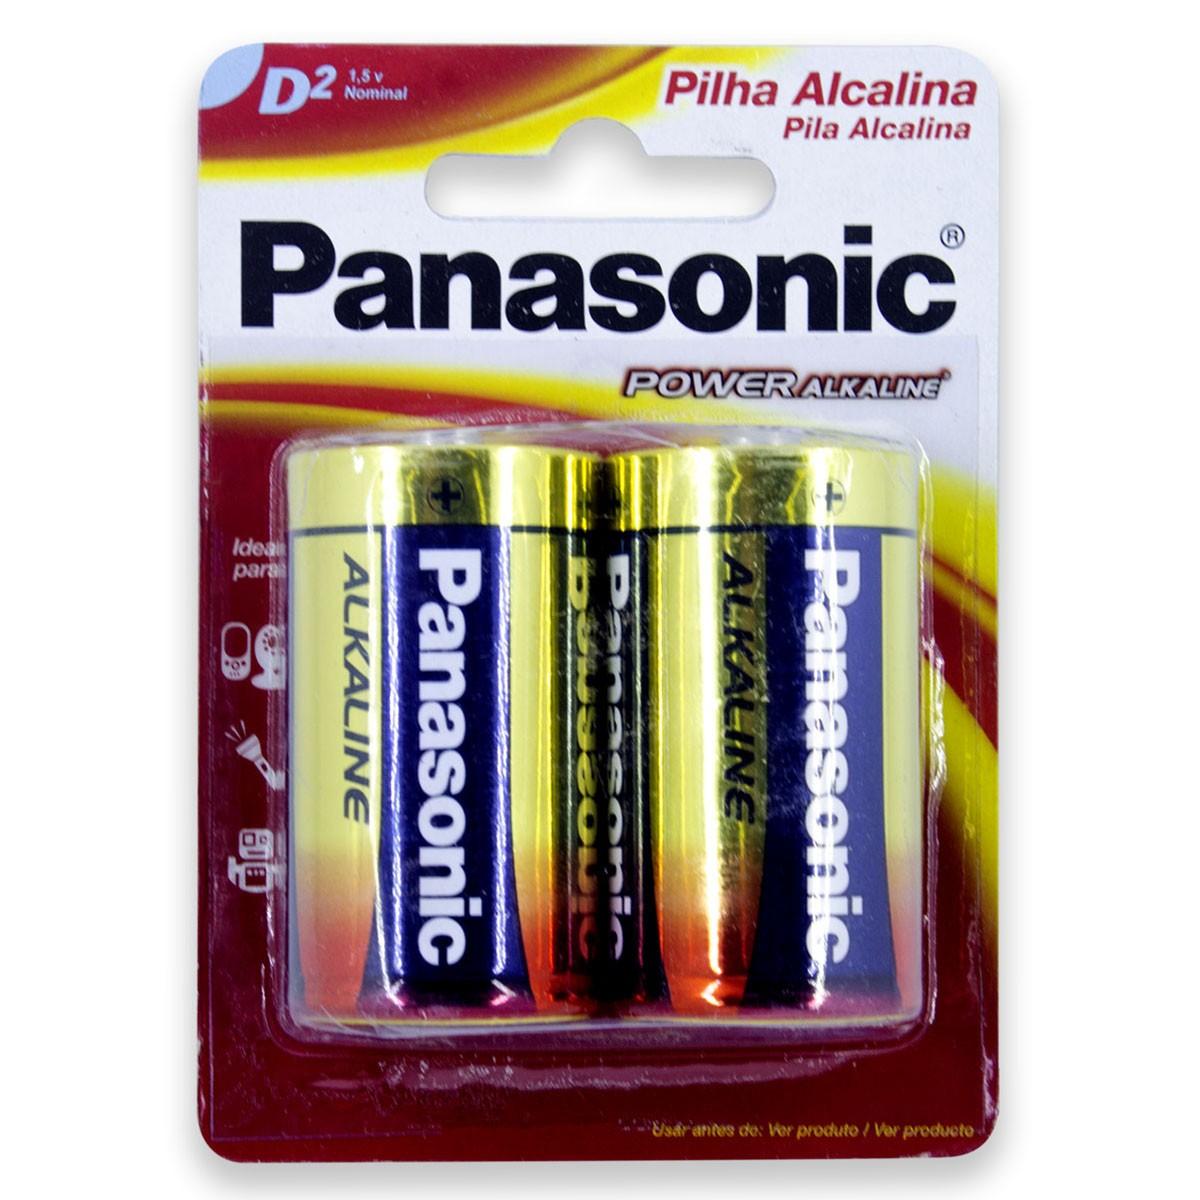 08 Pilhas D Grande LR20 Alcalina PANASONIC 4 Cartelas